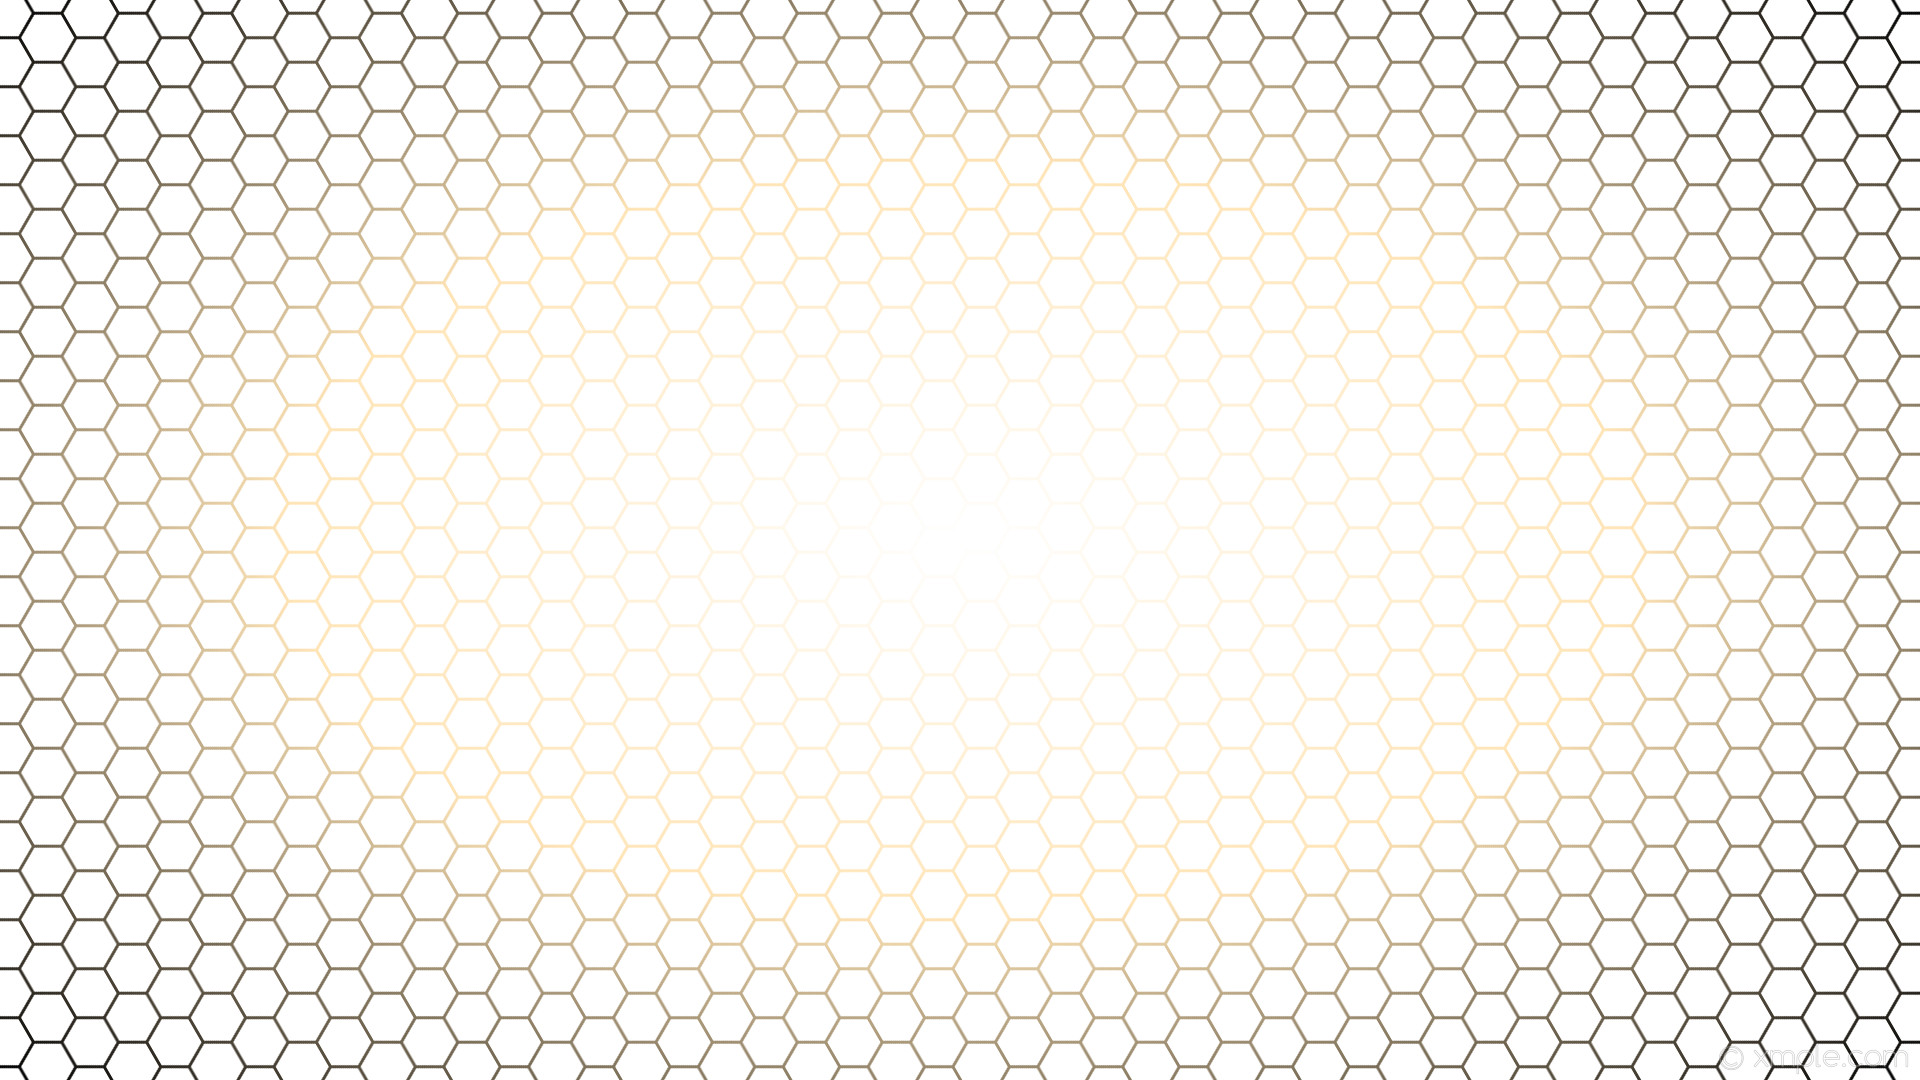 wallpaper yellow hexagon black gradient glow white moccasin #ffffff #ffffff  #ffe4b5 diagonal 30